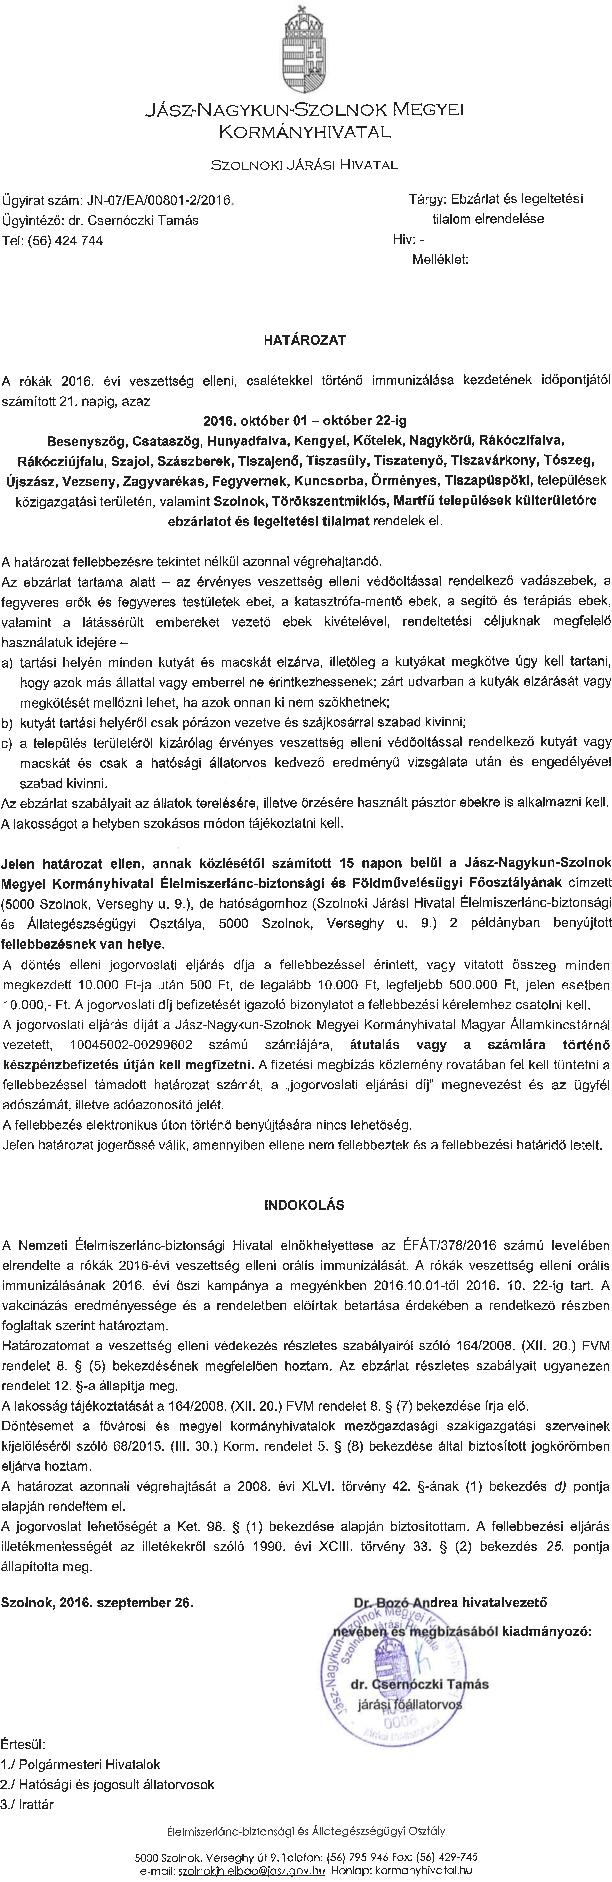 legeltetesi_tilalom_2016_10_01